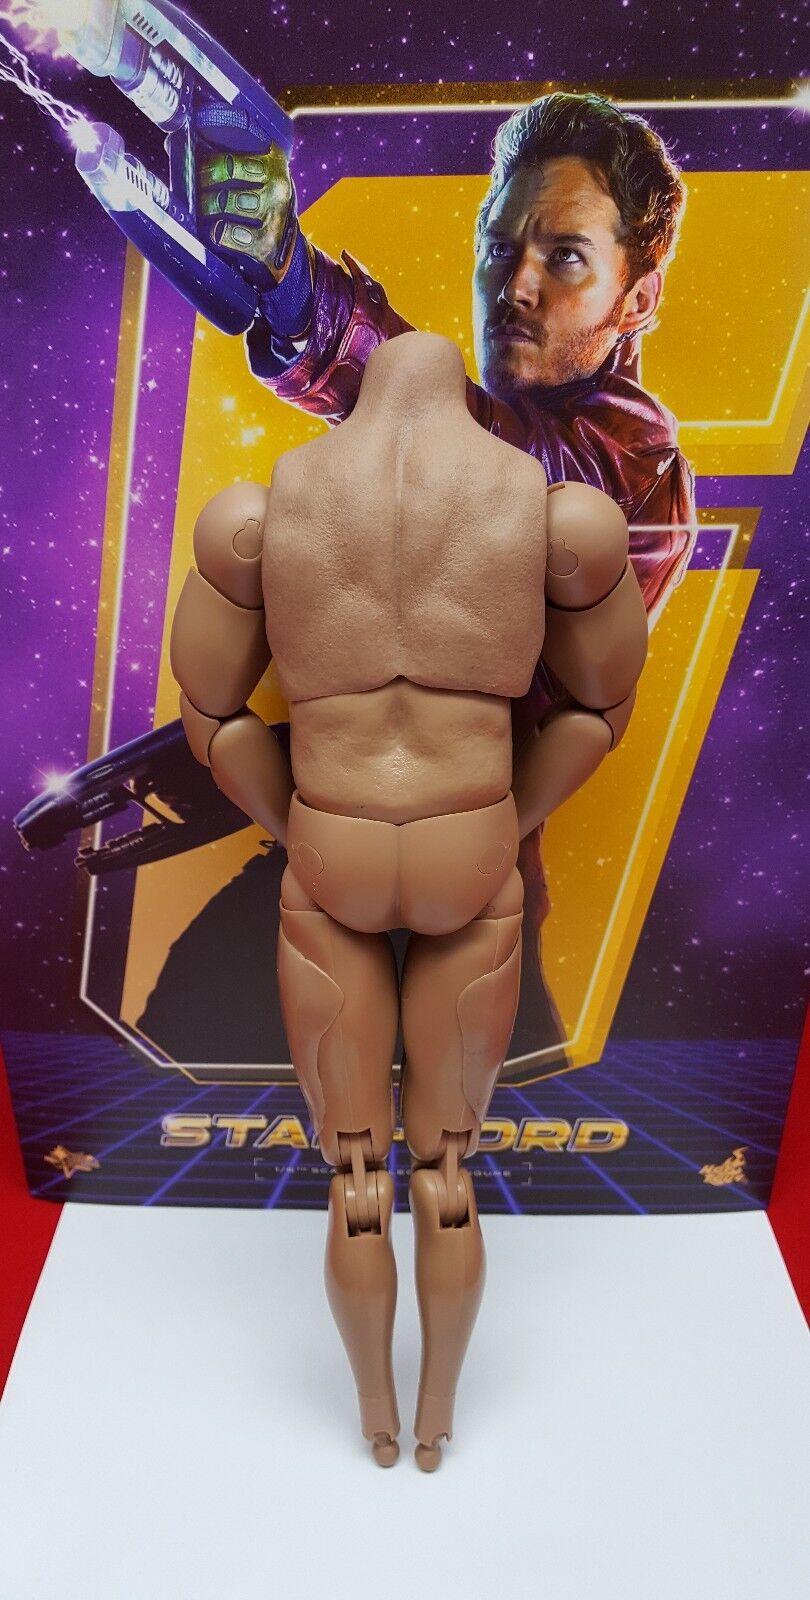 Caliente giocattoli MMS255 Guardians Galaxy estrella LORD azione cifra cifra cifra 1 6 scale corpo only   a2ebbf